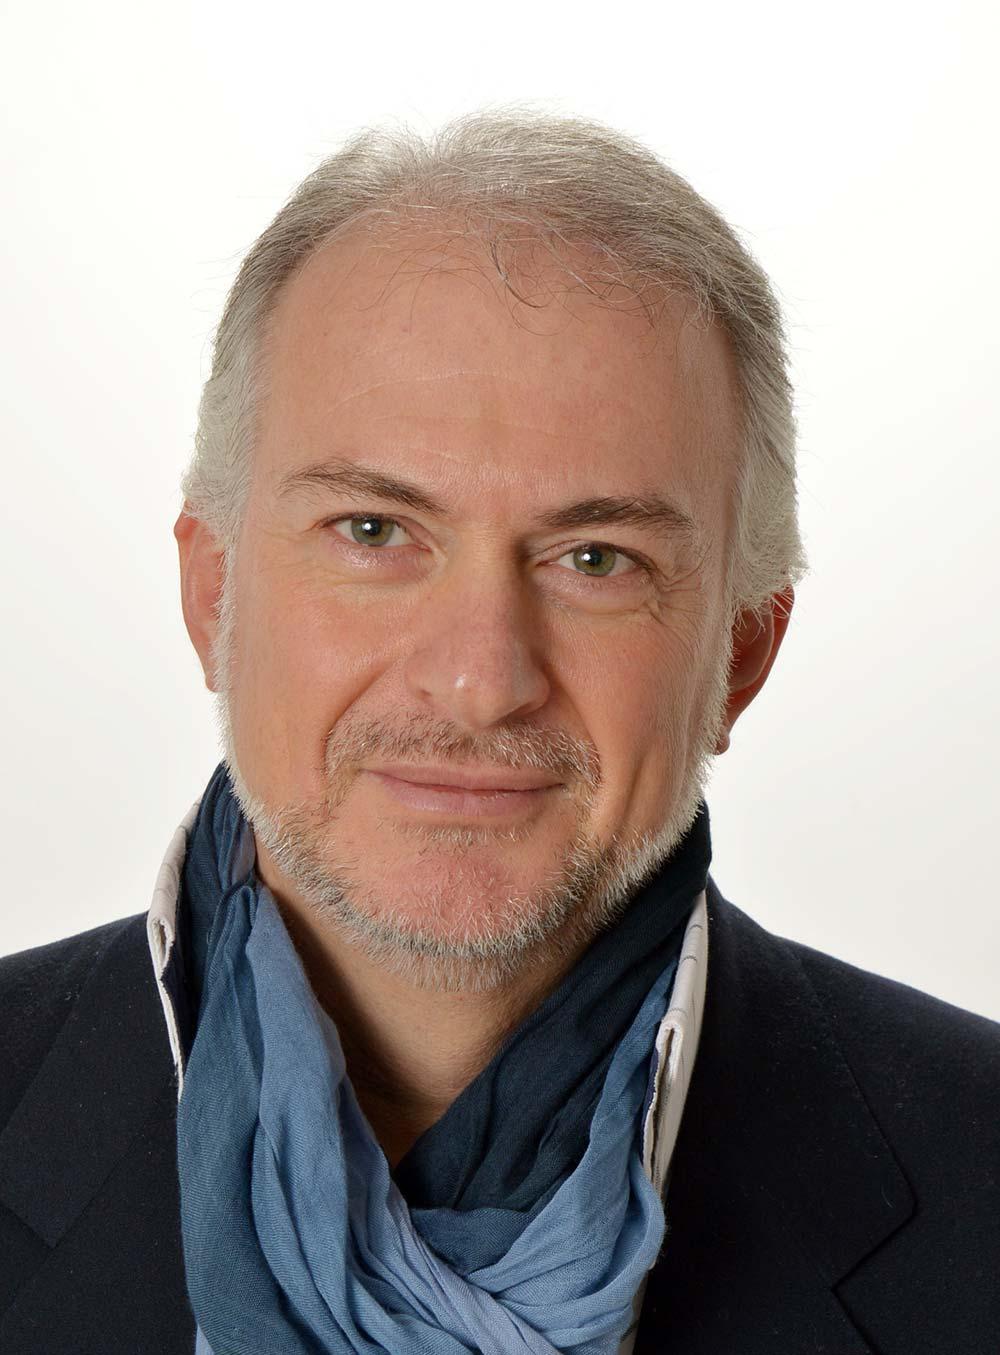 Carlo C - I am management